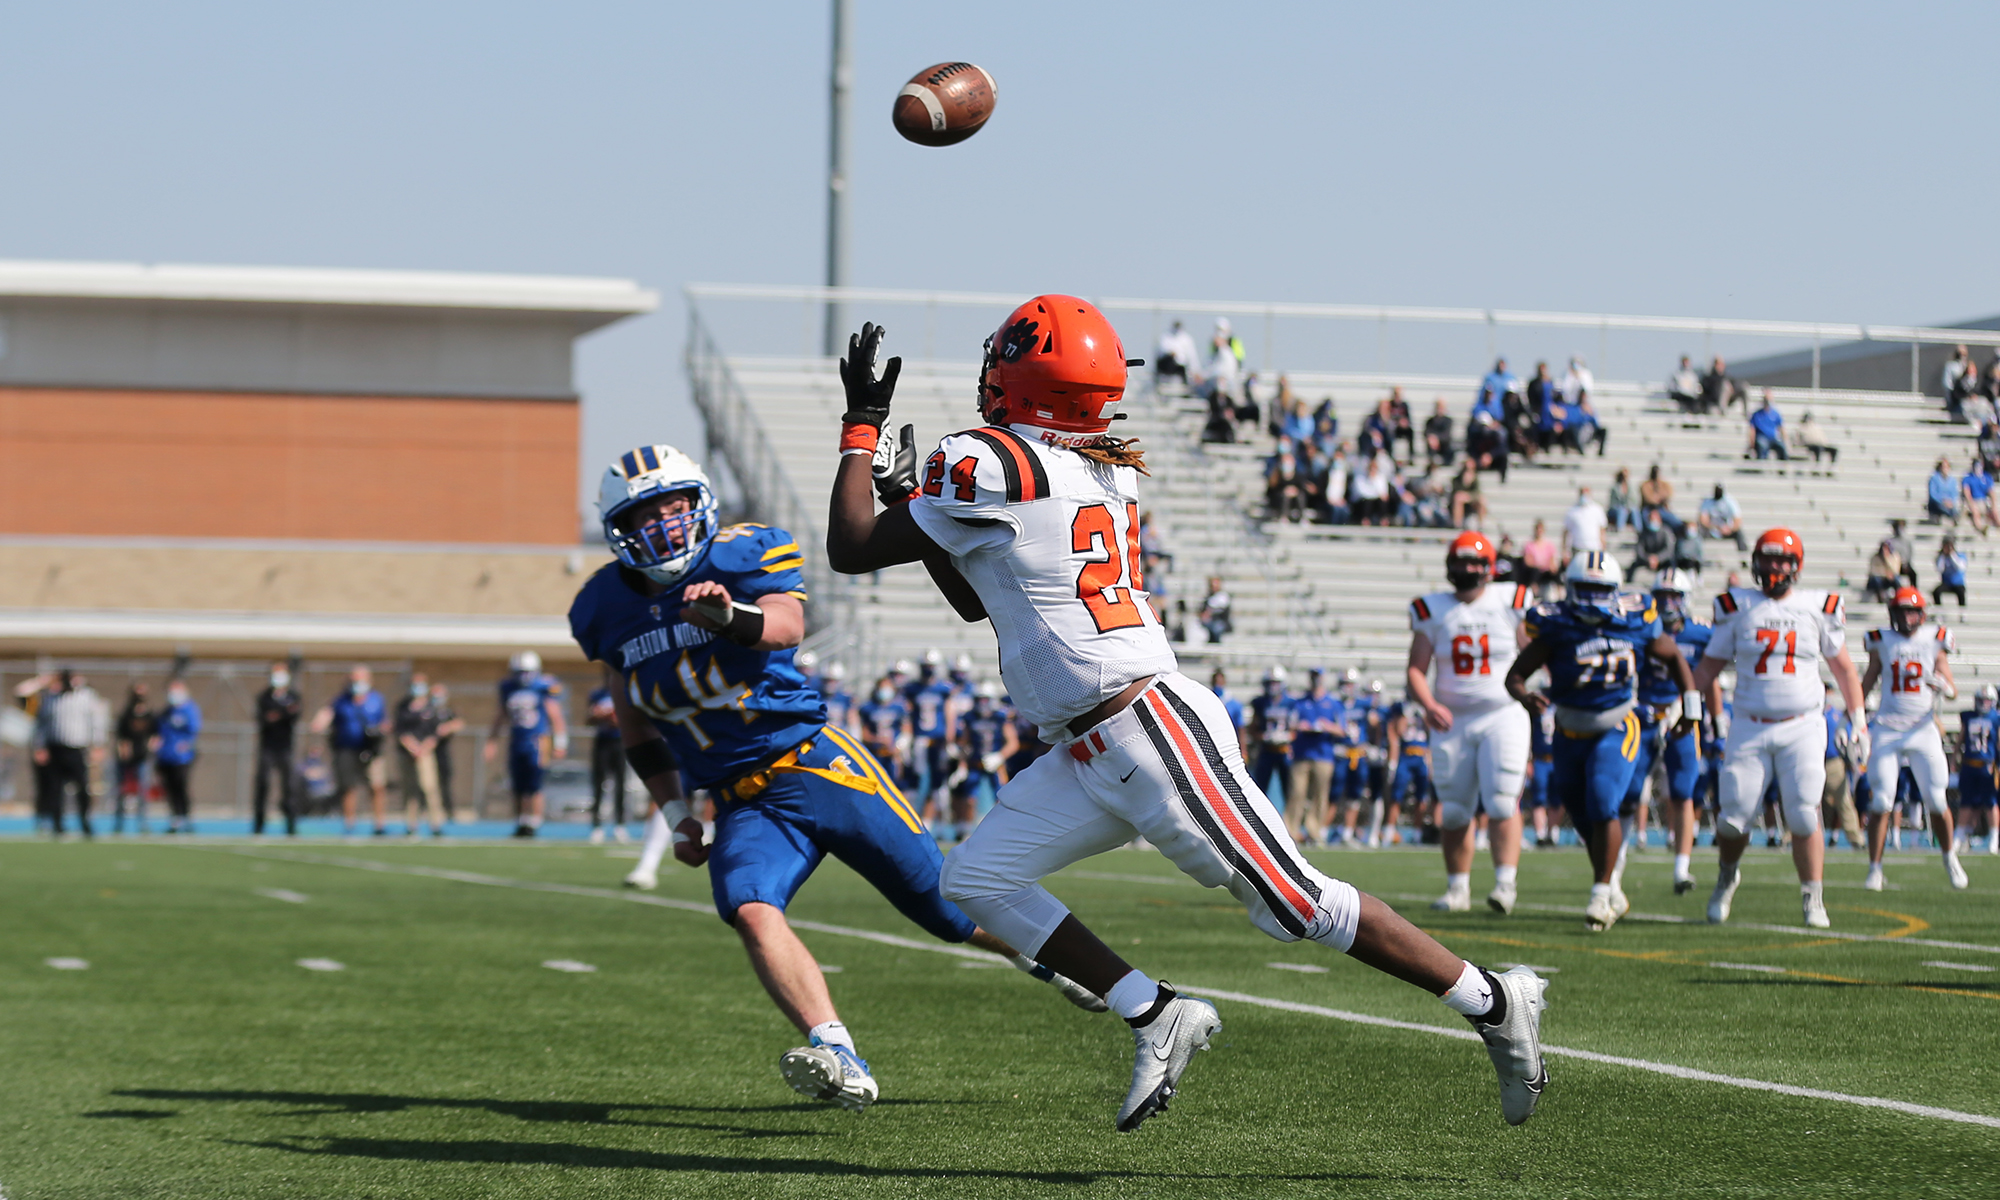 Wheaton Warrenville South's Eddie Robbinson (24) catches a pass for a touchdown against Wheaton North.